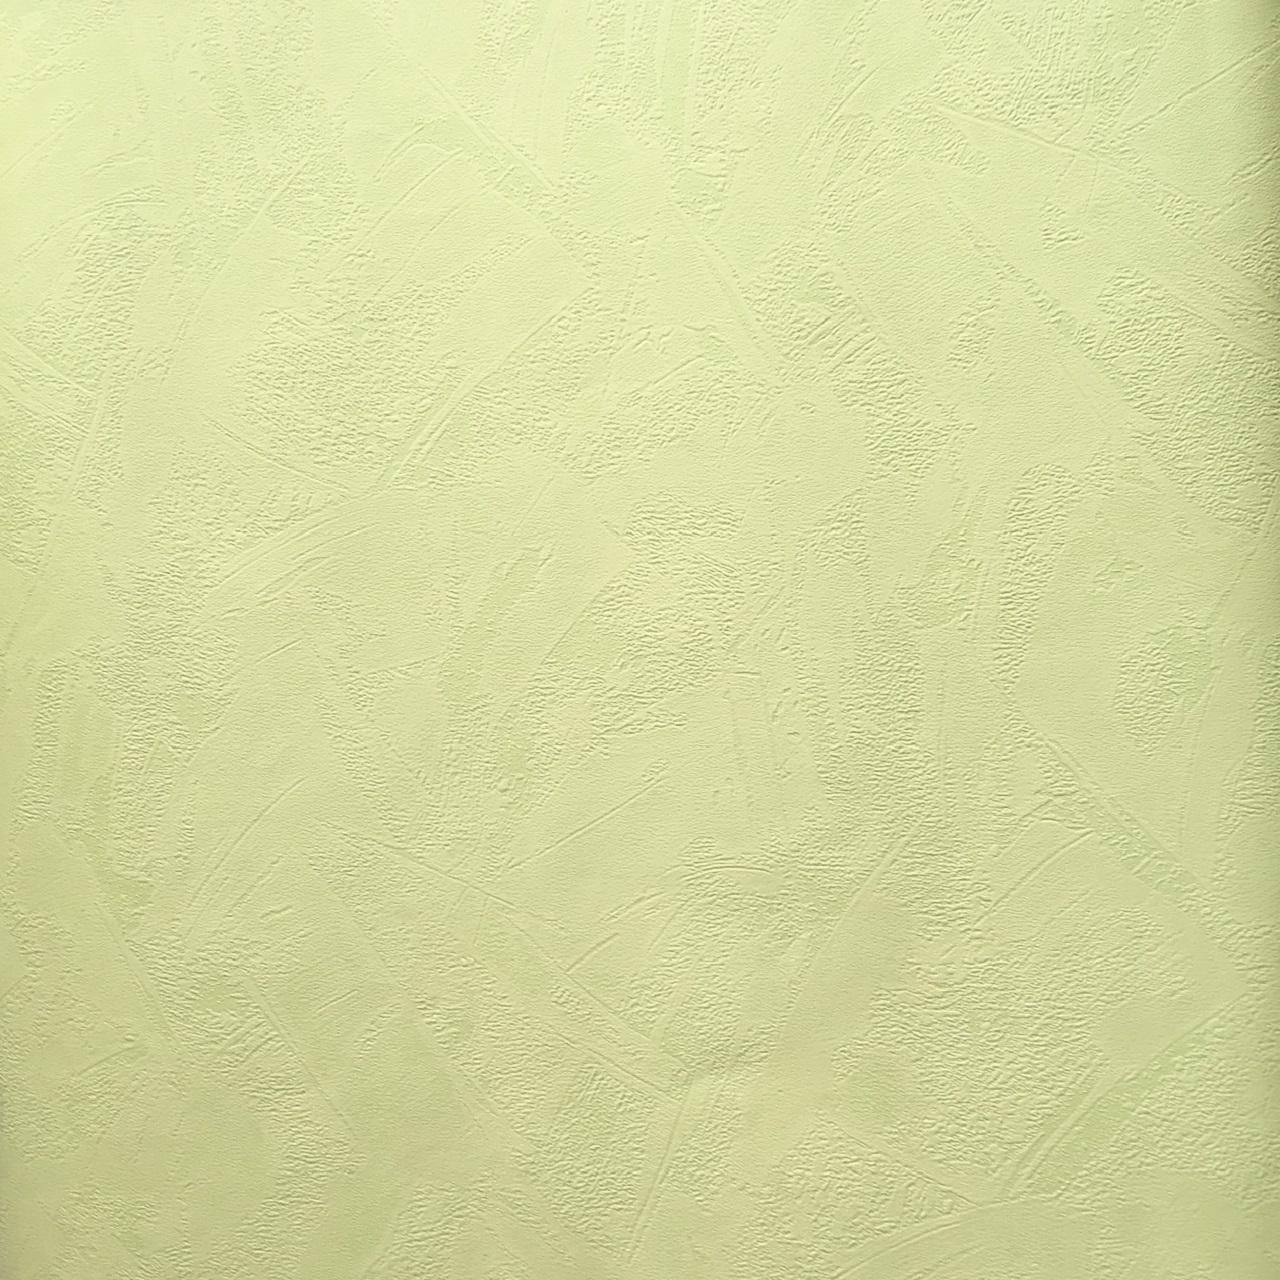 کاغذ دیواری پرومور مدل DUPLEX ASA 40091